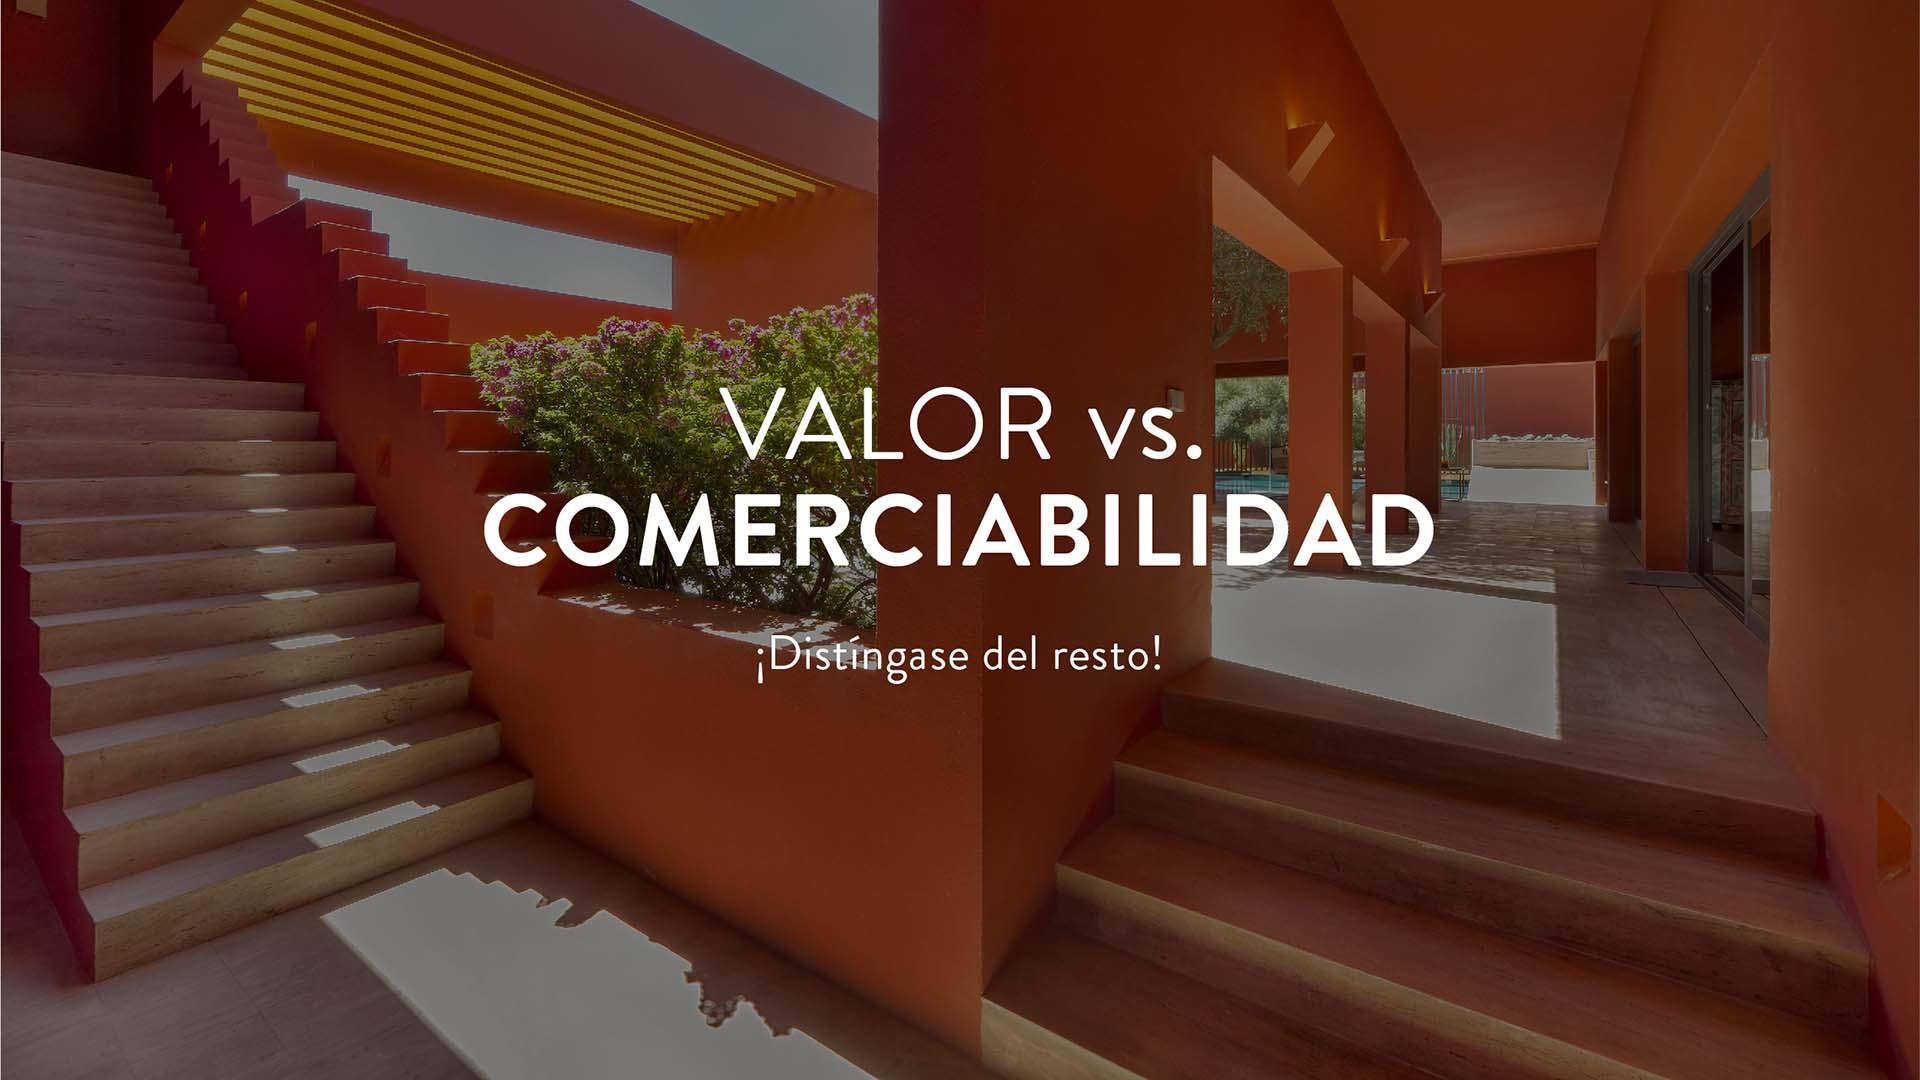 valor-vs-comerciabilidad-noll-sotogrande-charles-gubbins-blog-oct-2019-4